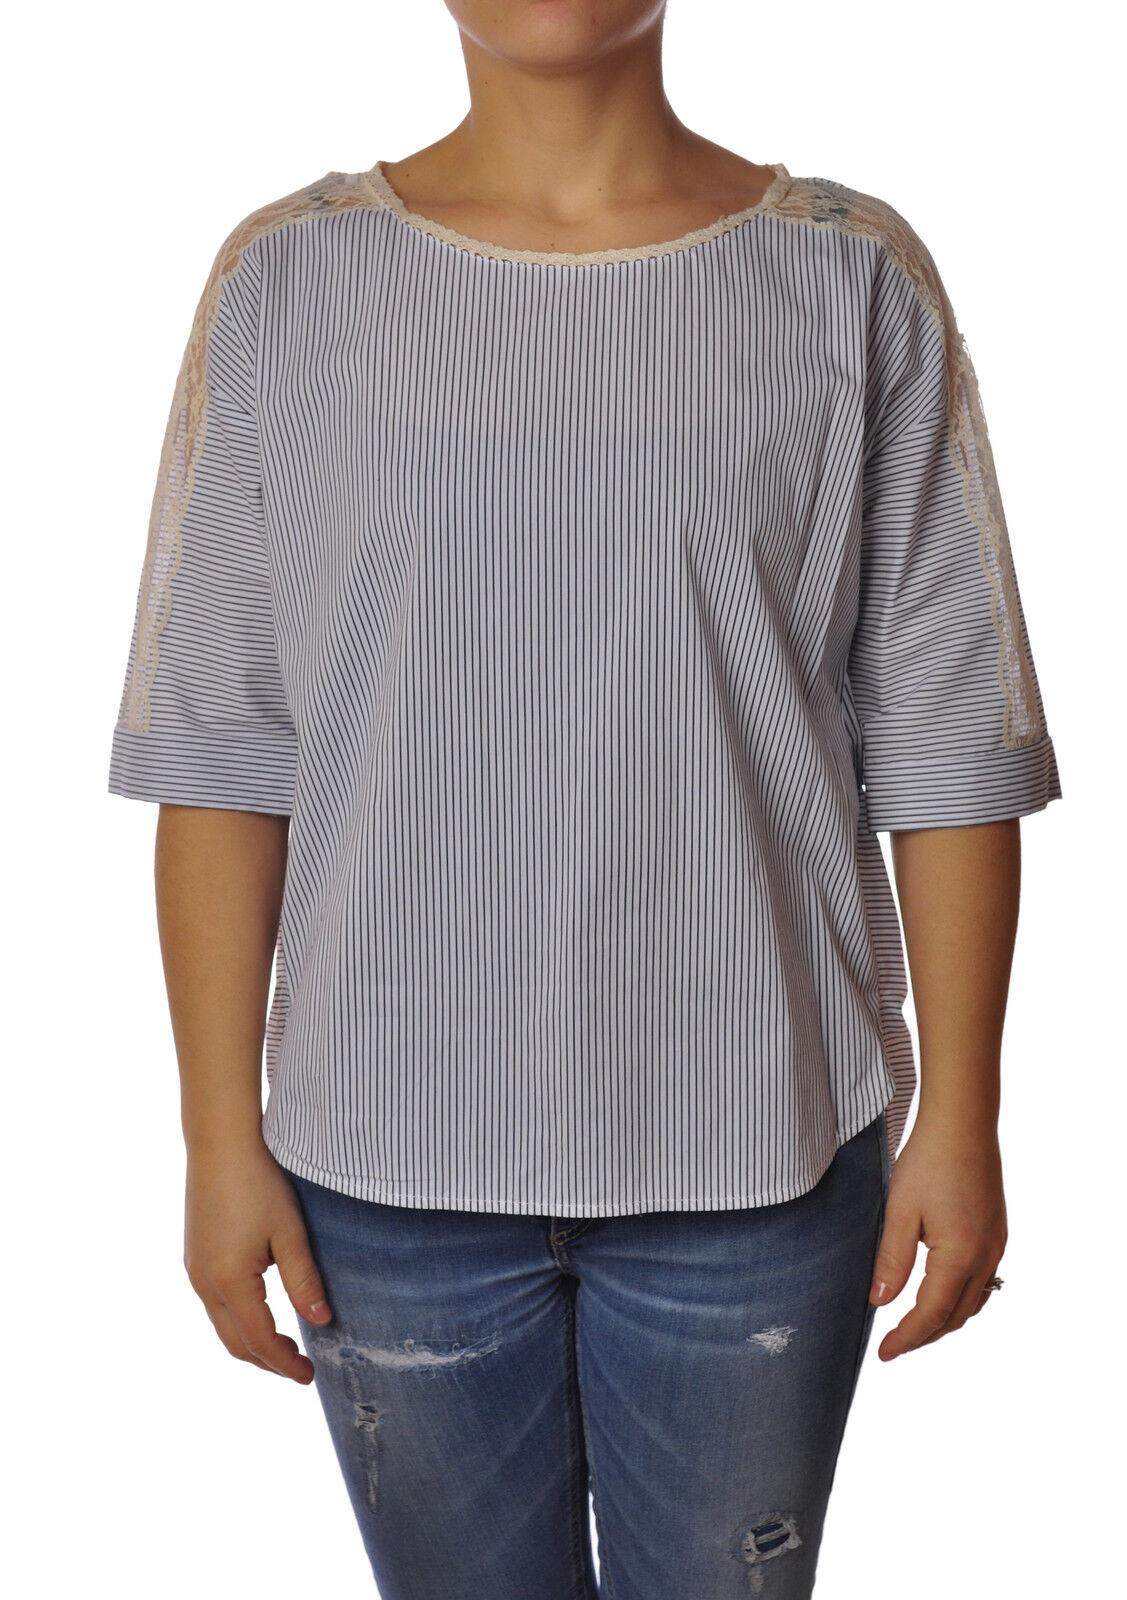 Twin Set  -  Camiseta - Mujer - Negro - 3057007A184315